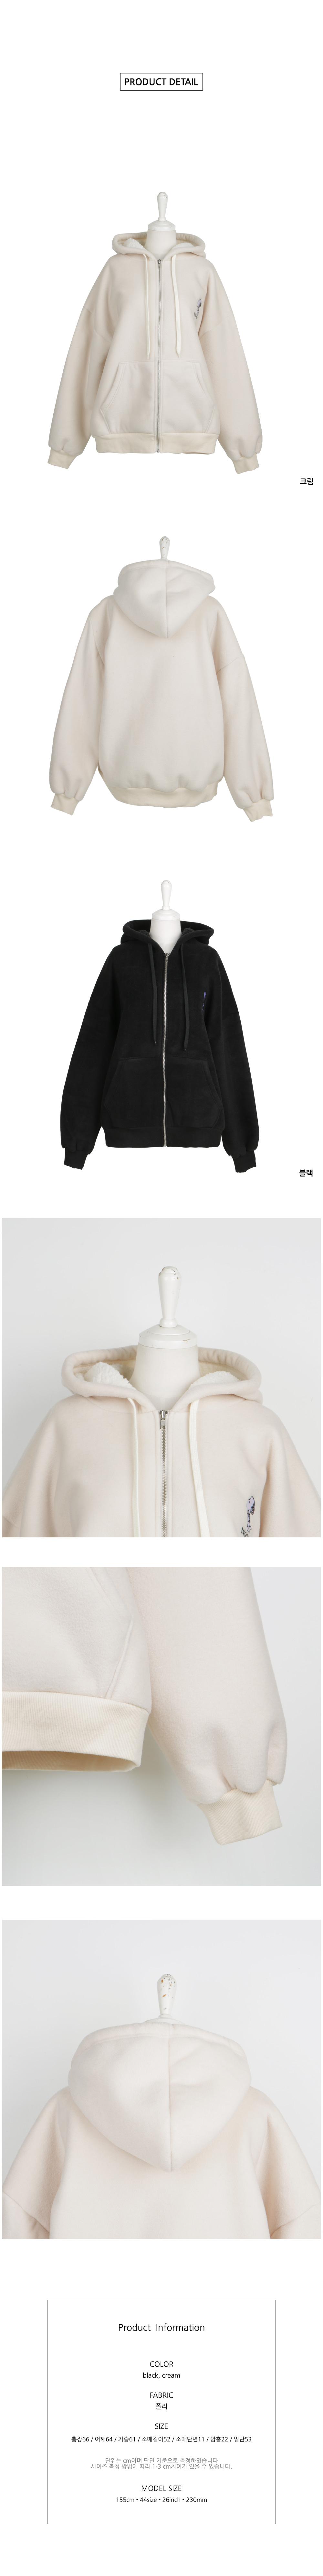 Snoopy fleece fleece hooded zip O#YW342